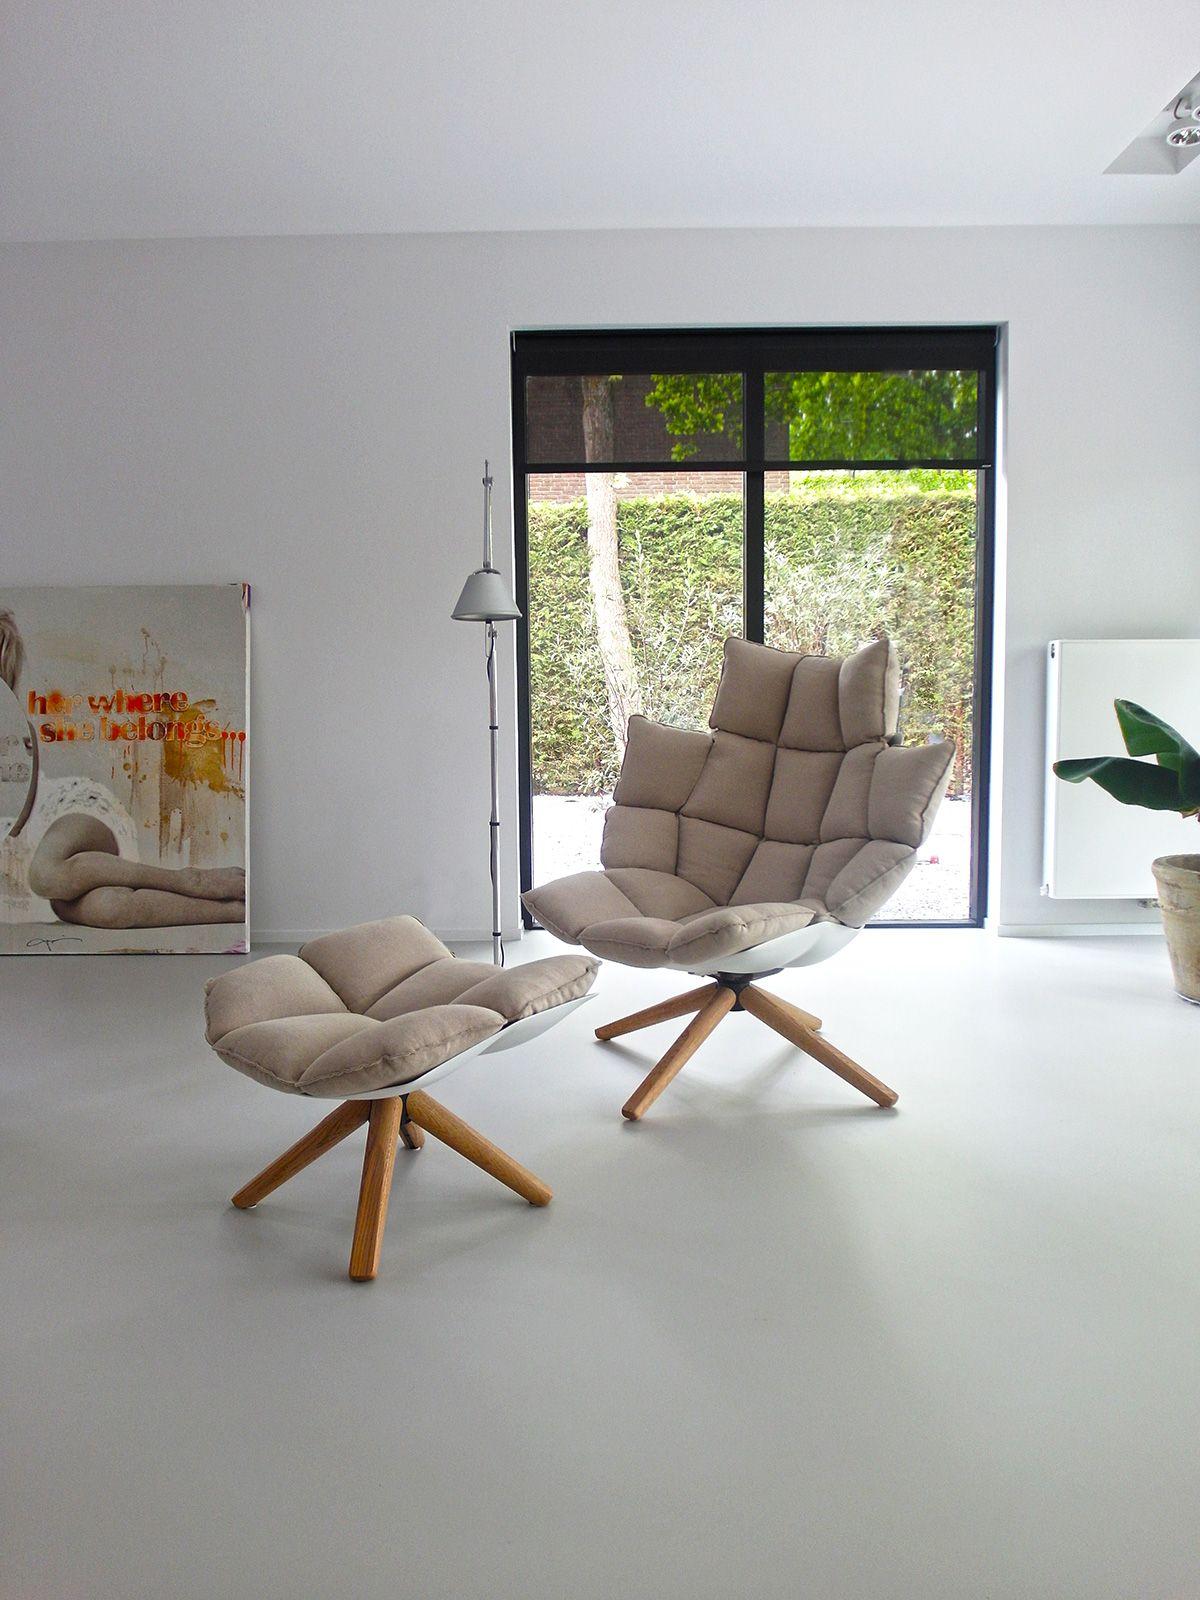 Gietvloer woonkamer grijs B&B Italia Husk fauteuil Wassenaar ...